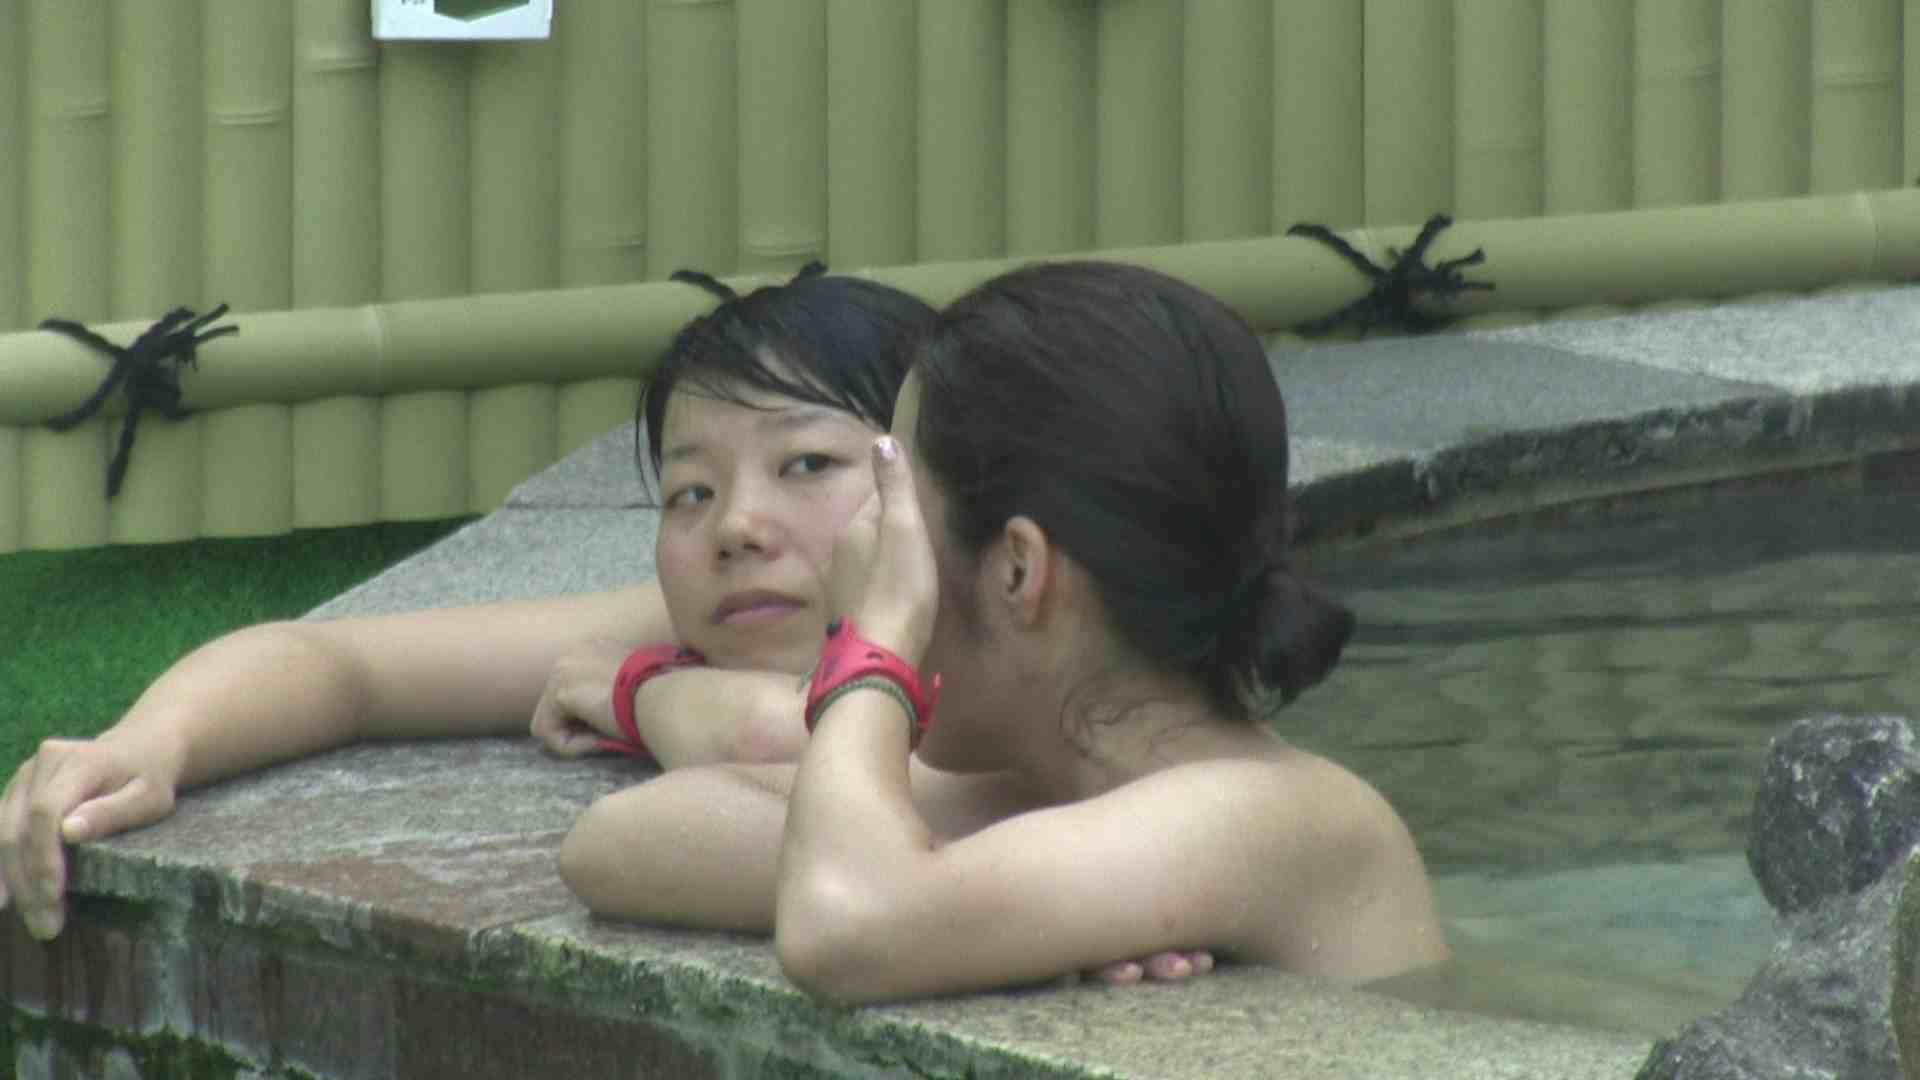 Aquaな露天風呂Vol.182 露天 | OLセックス  80画像 37